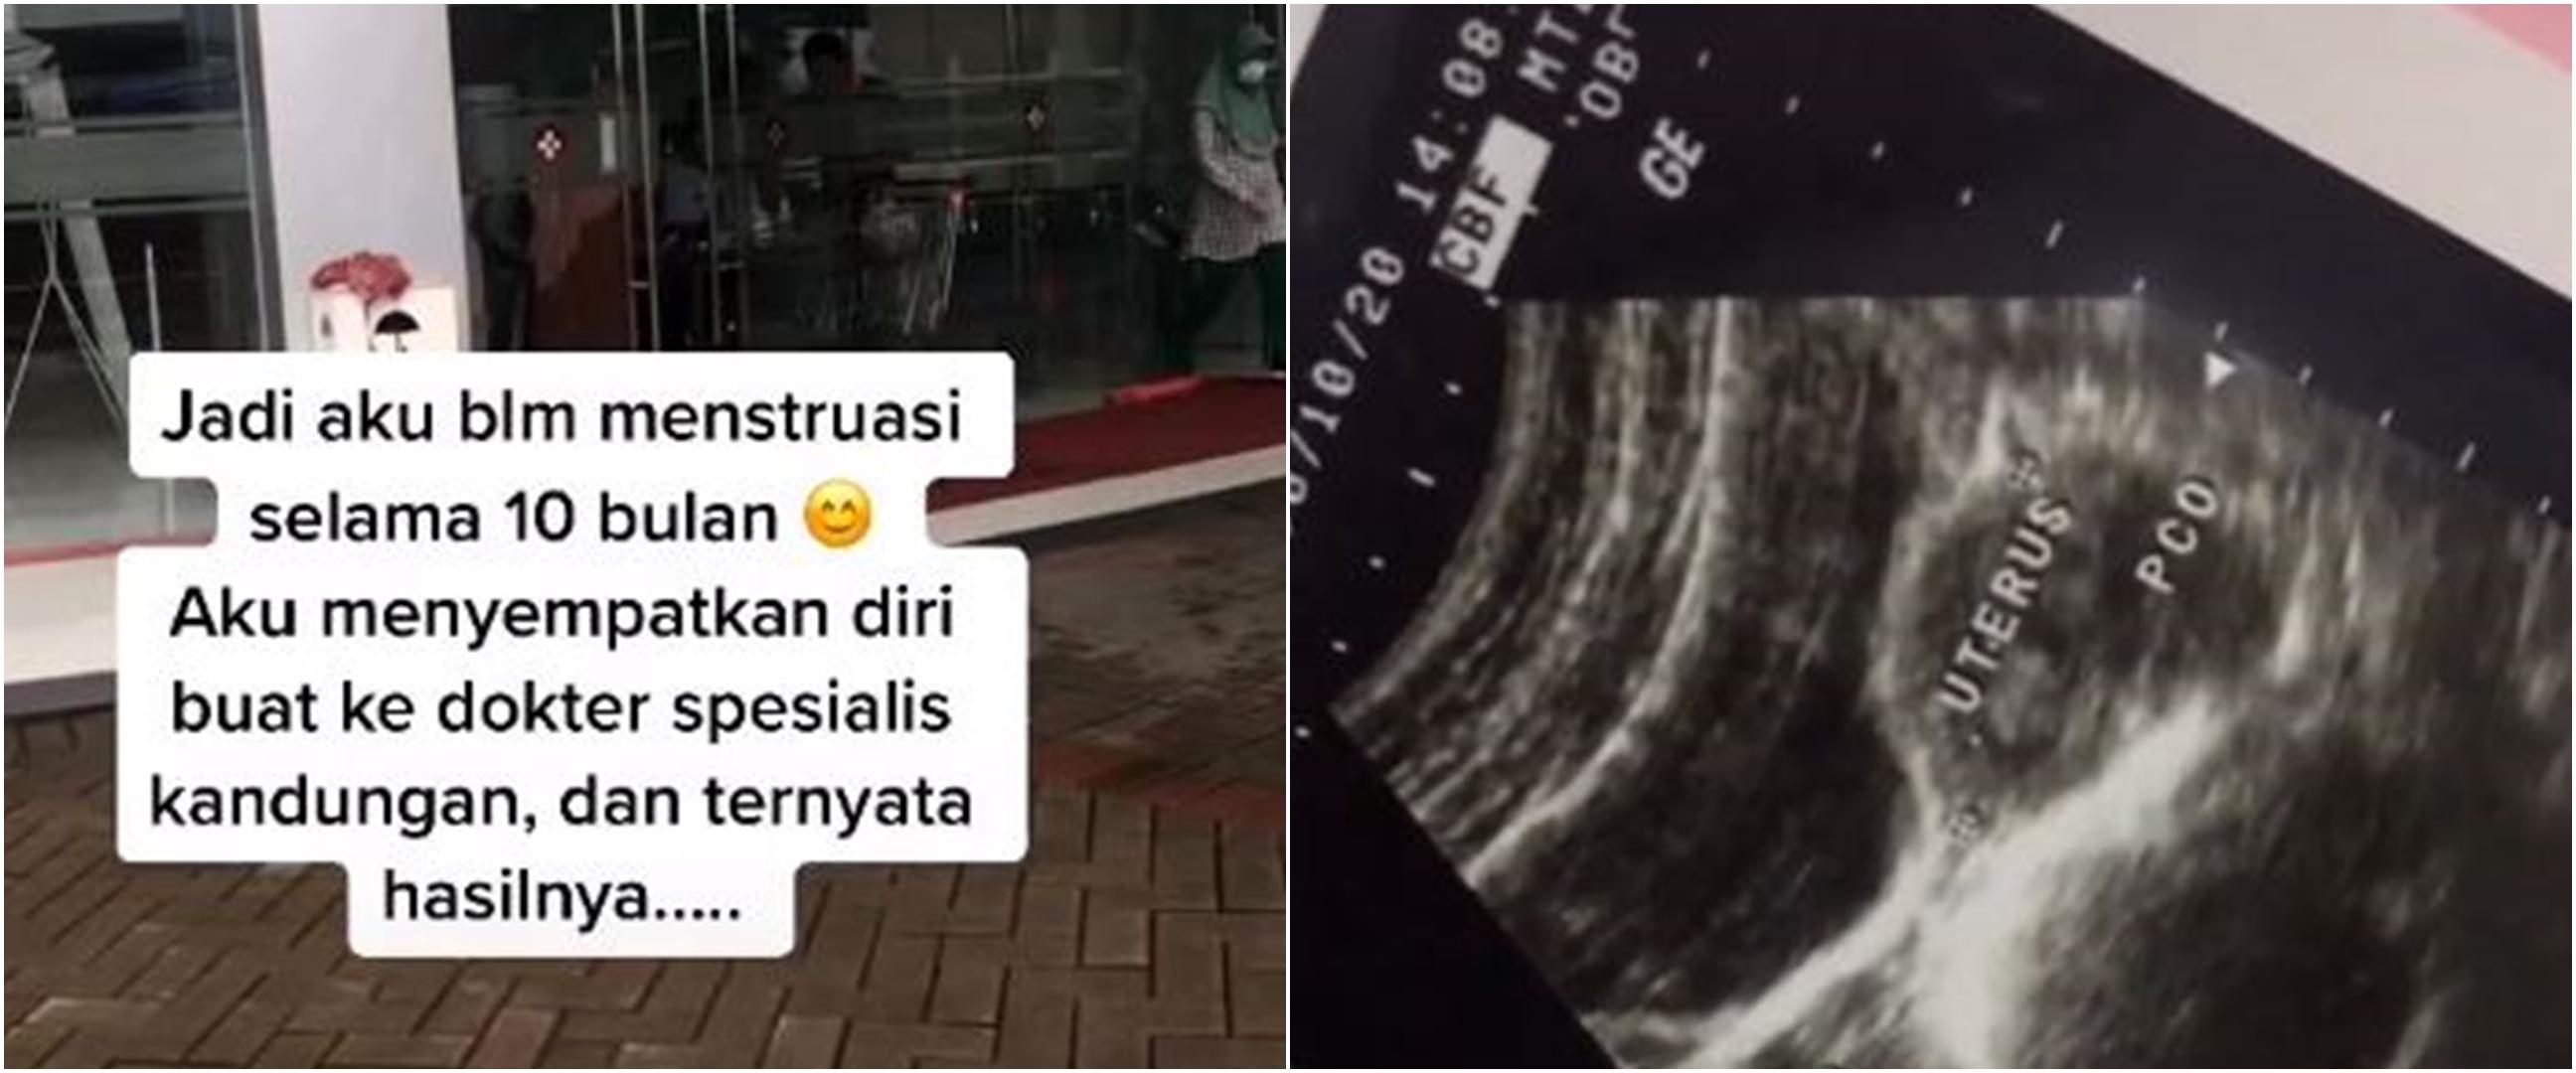 Viral cerita cewek tak bisa haid 10 bulan, penyebabnya bikin kaget